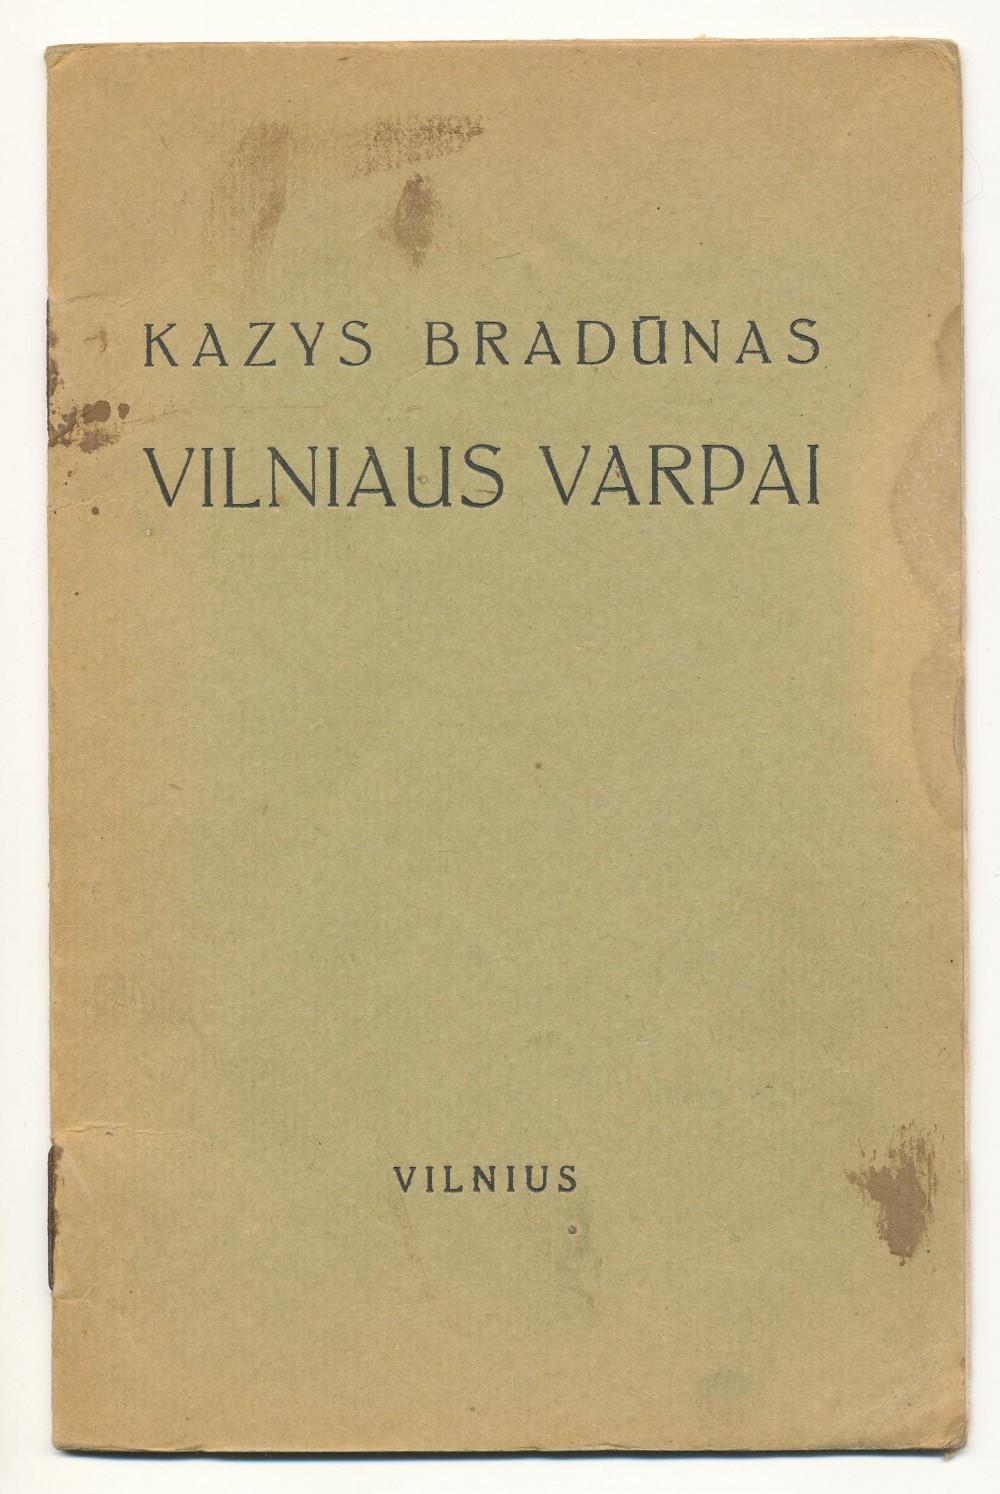 Vilnius, 1943